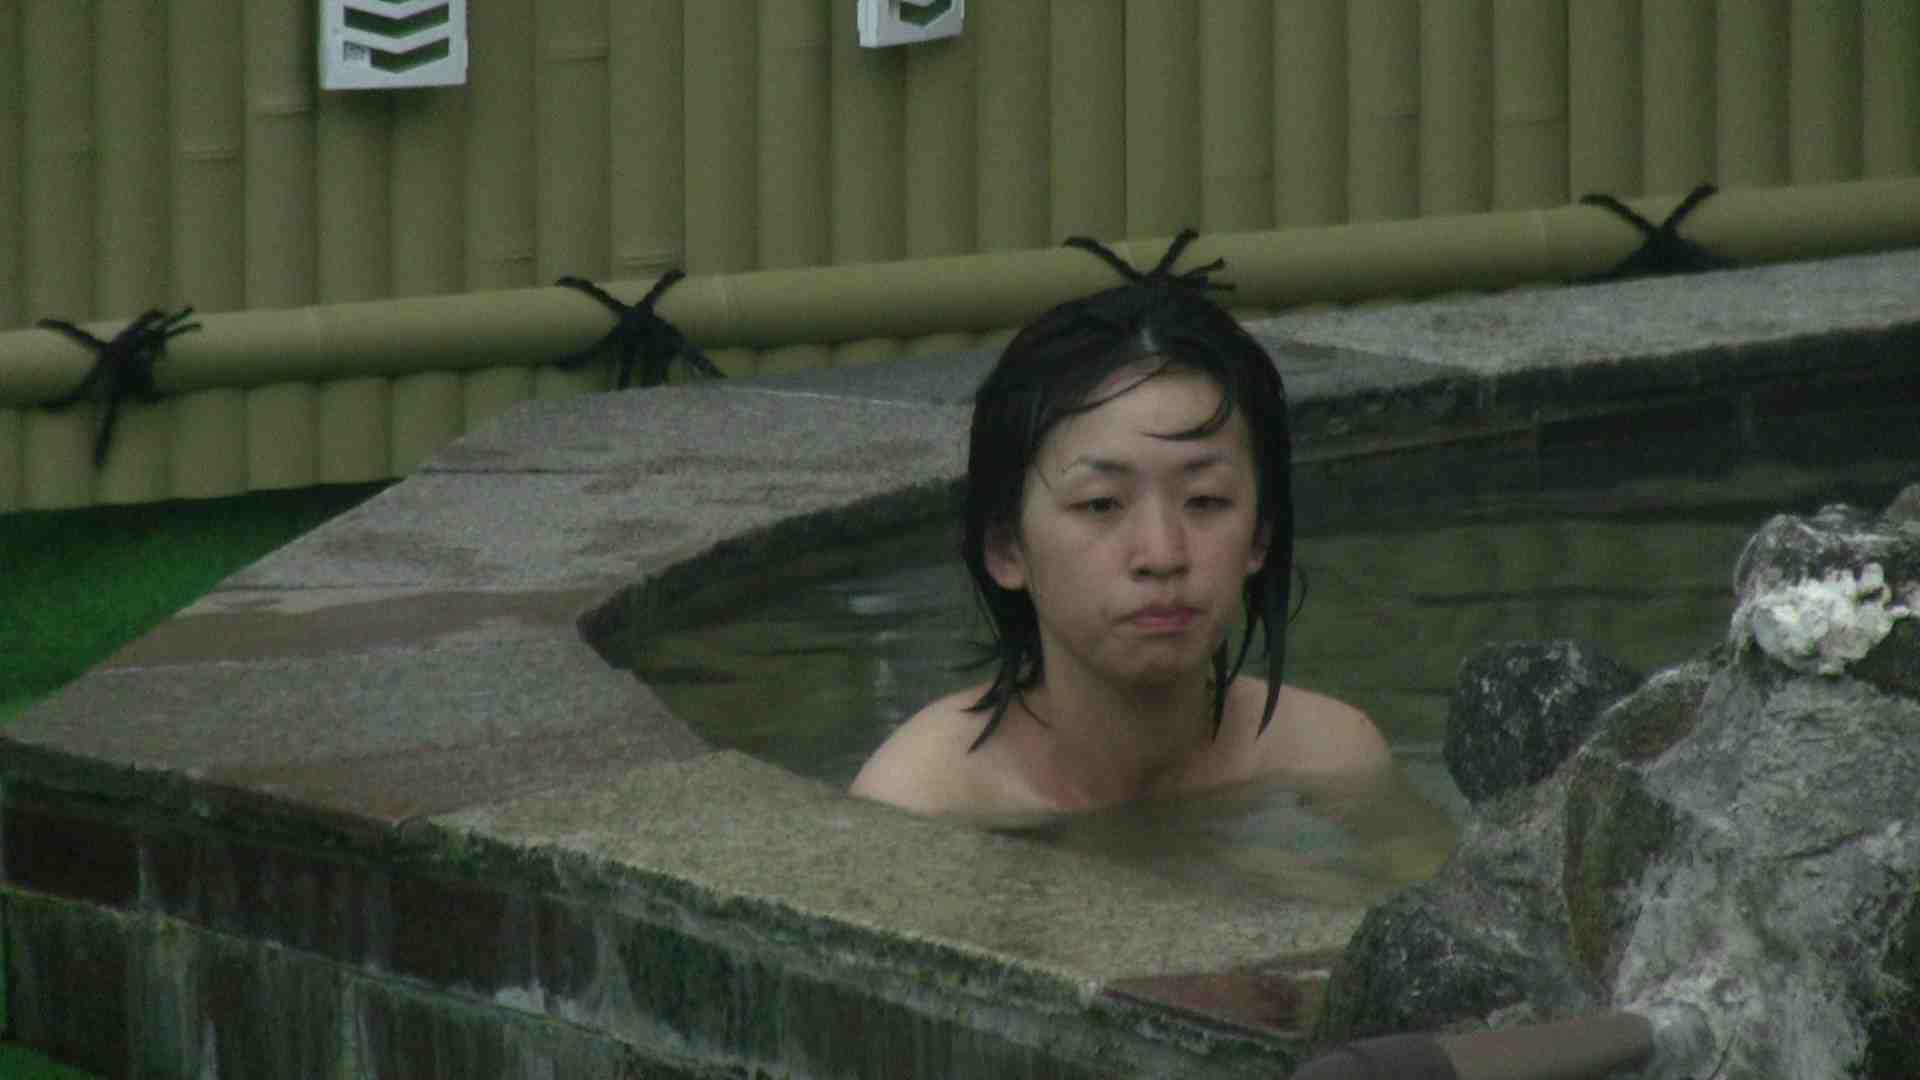 Aquaな露天風呂Vol.170 0  65連発 48